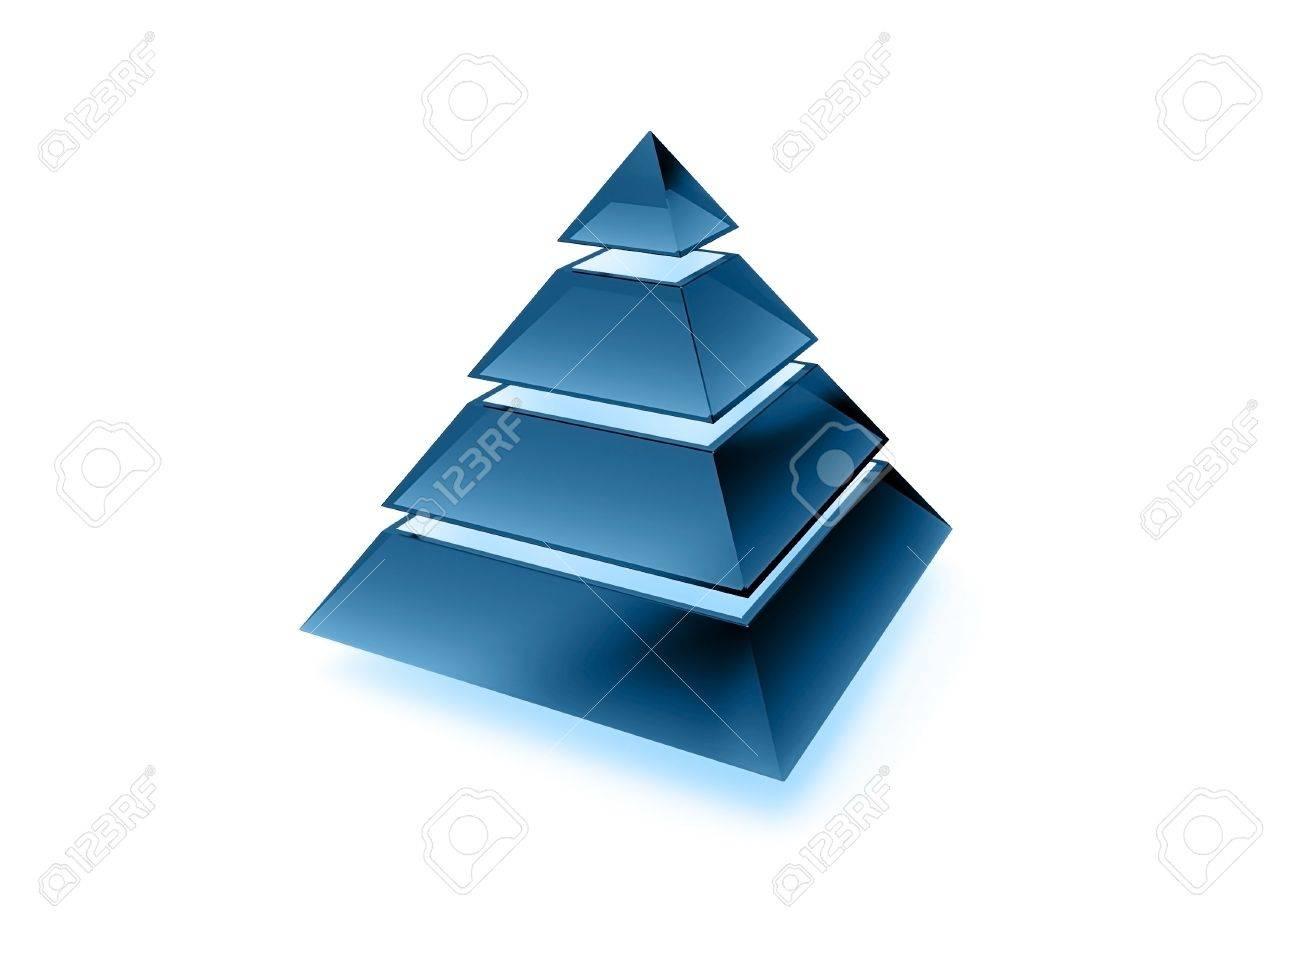 Illuminated layered pyramid made of dark blue glass isolated on white Stock Photo - 15232272